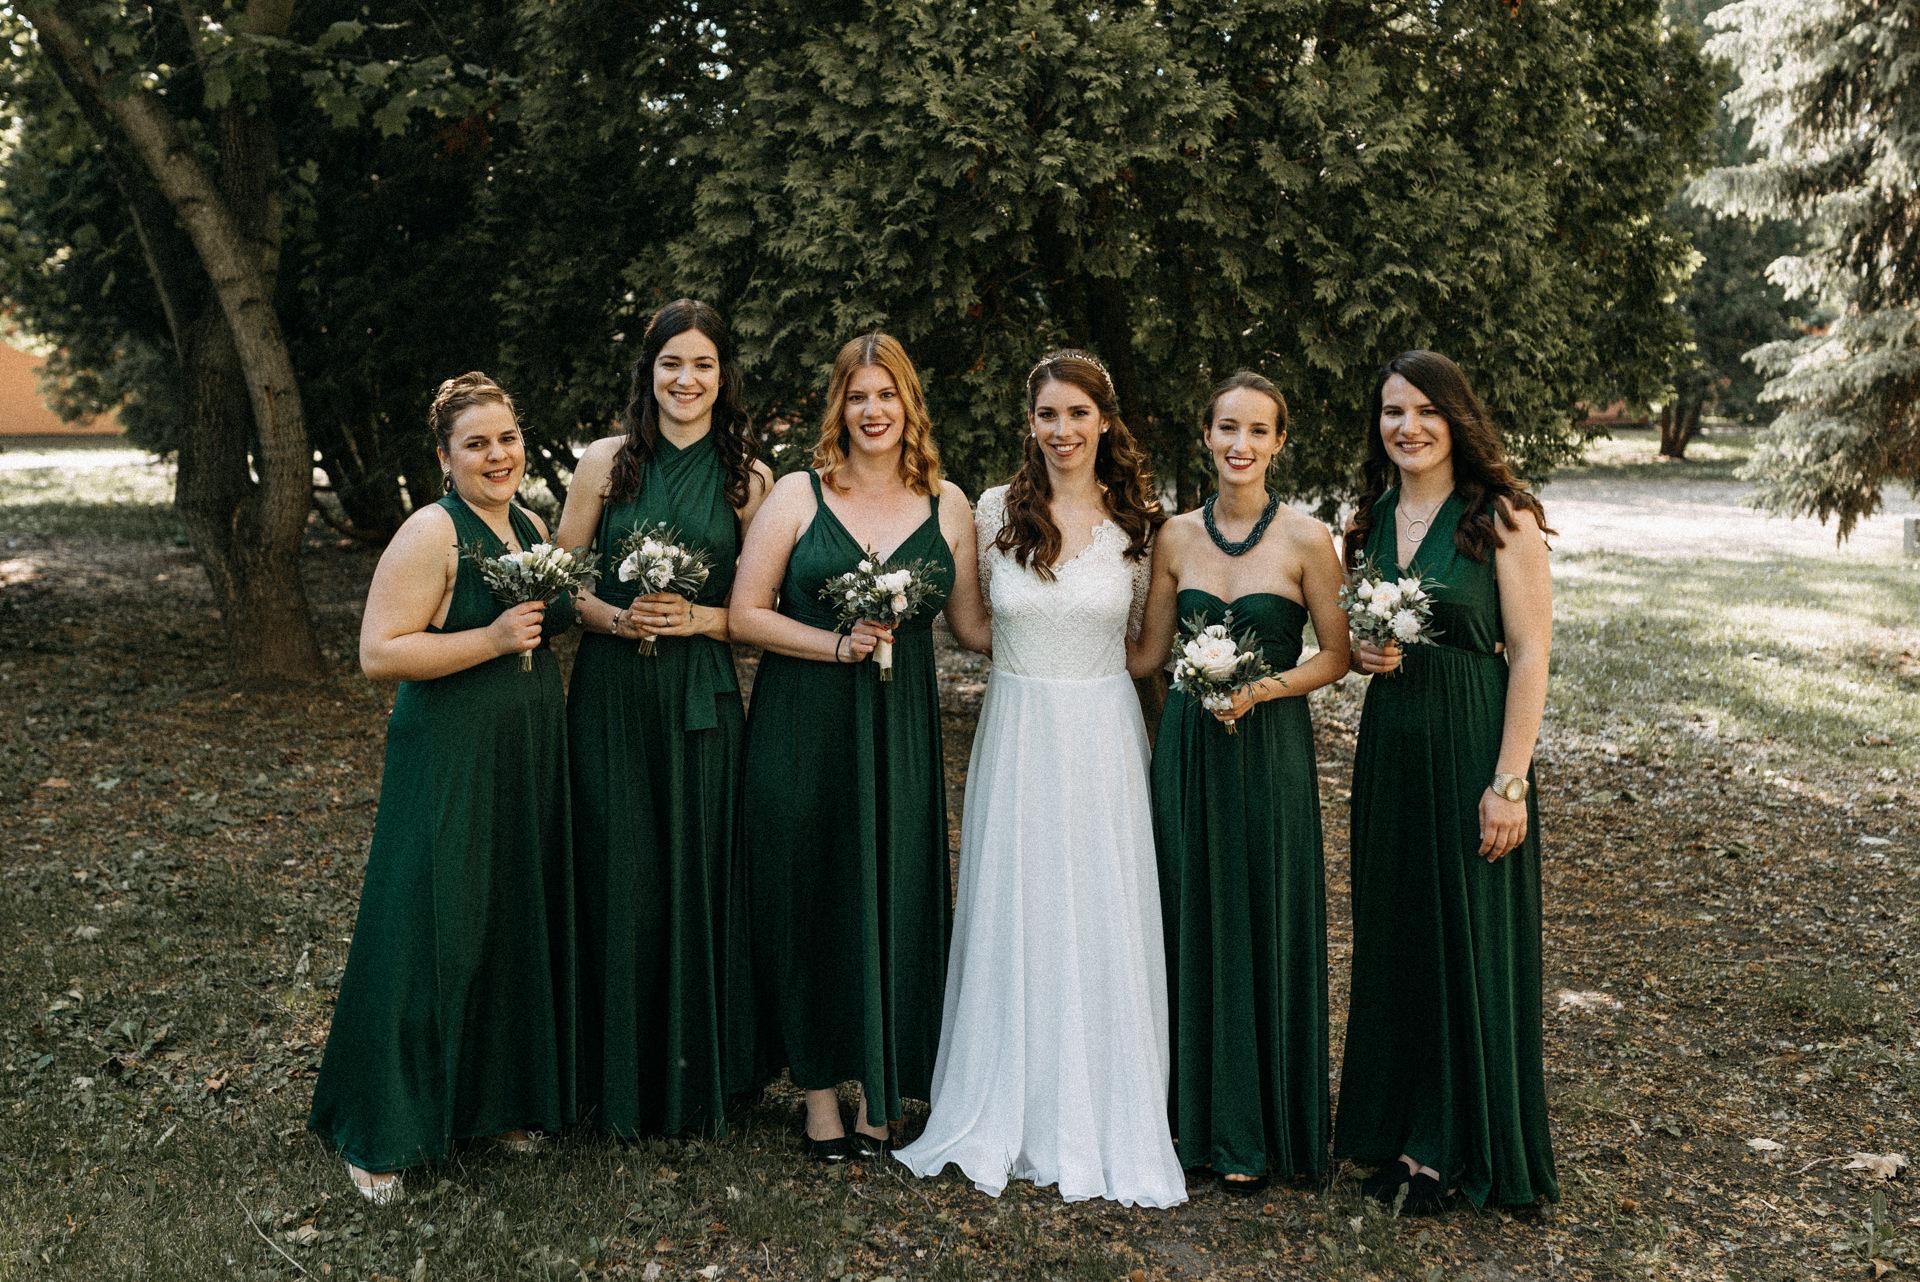 koszoruslanyok menyasszony bridesmaids bride balaton